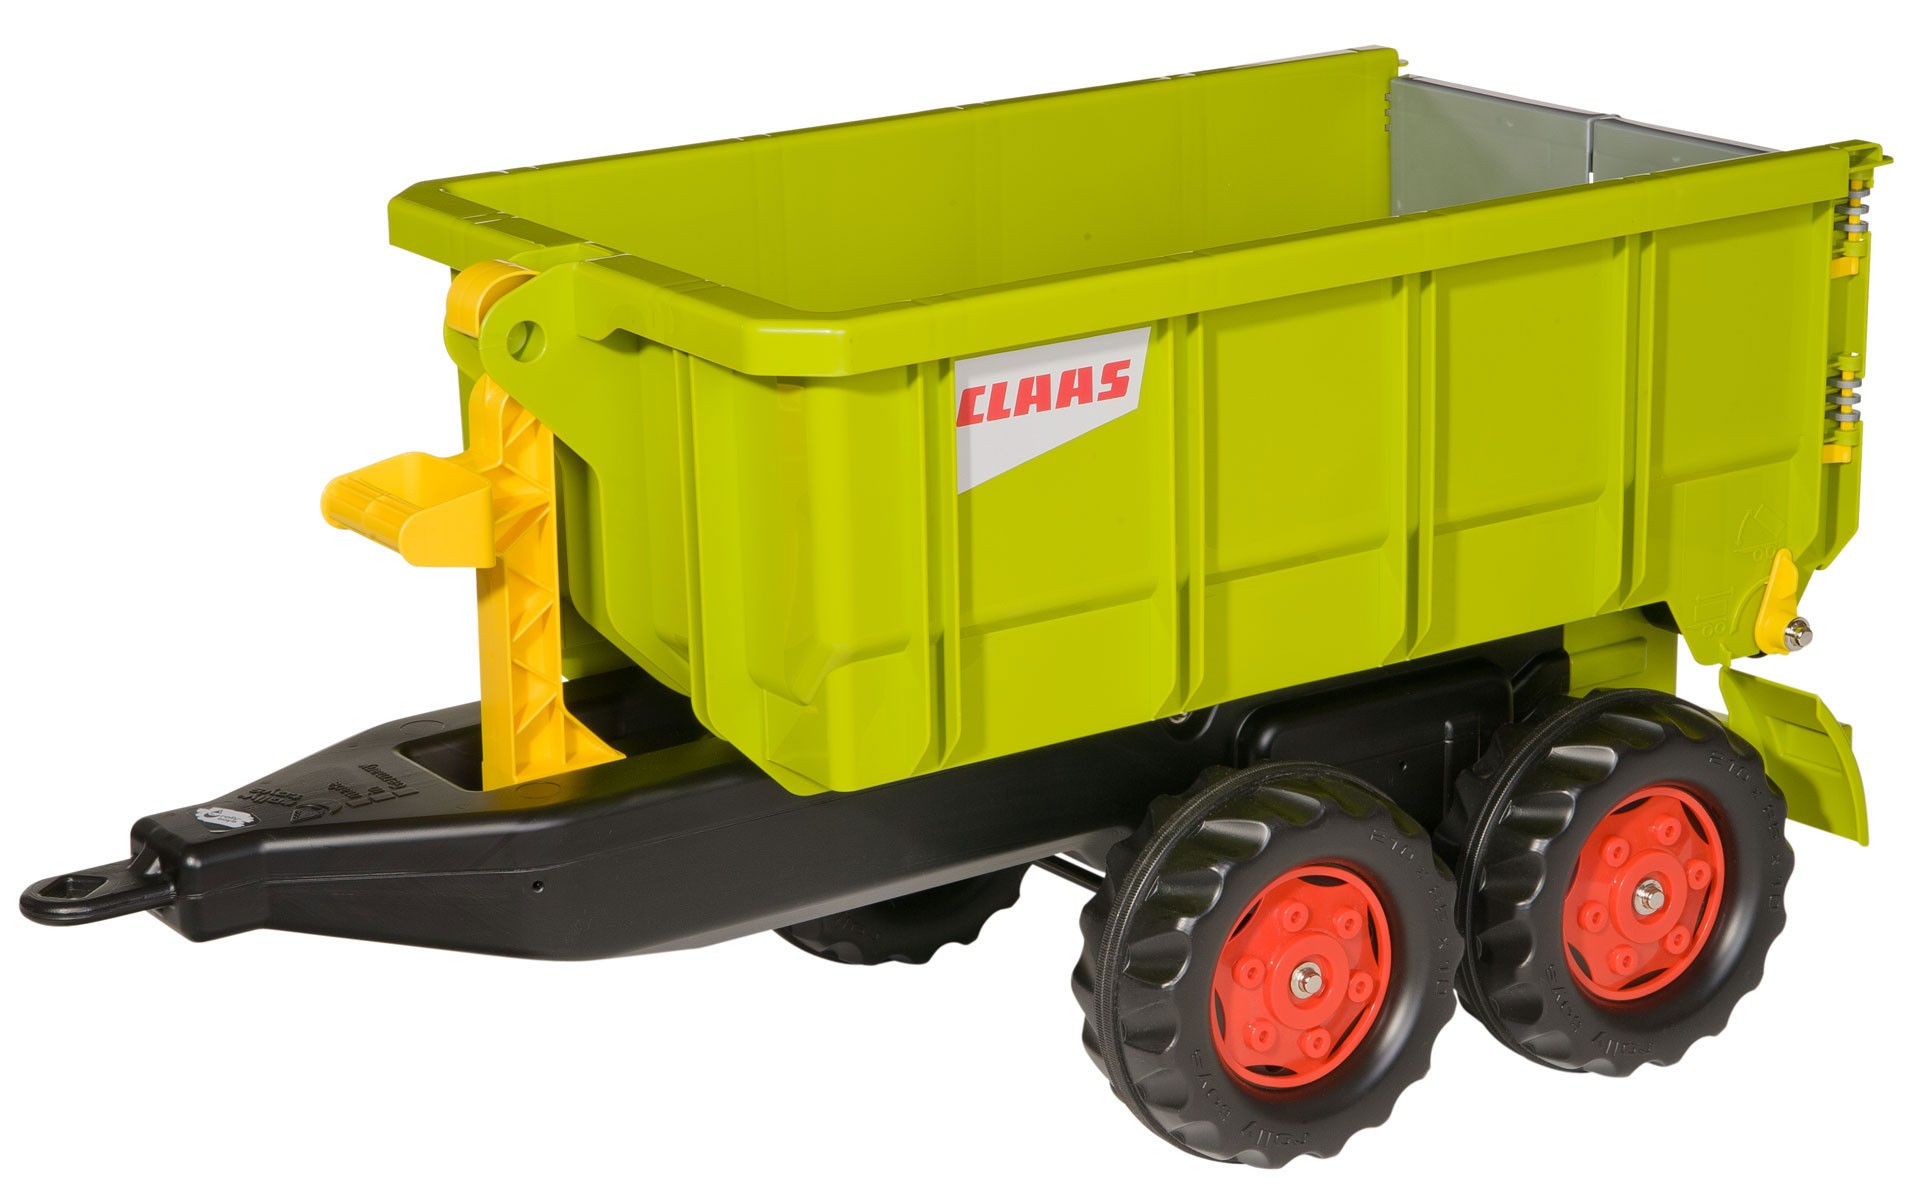 Anhänger für Tretfahrzeug rolly Container Claas grün - Rolly Toys Bild 1